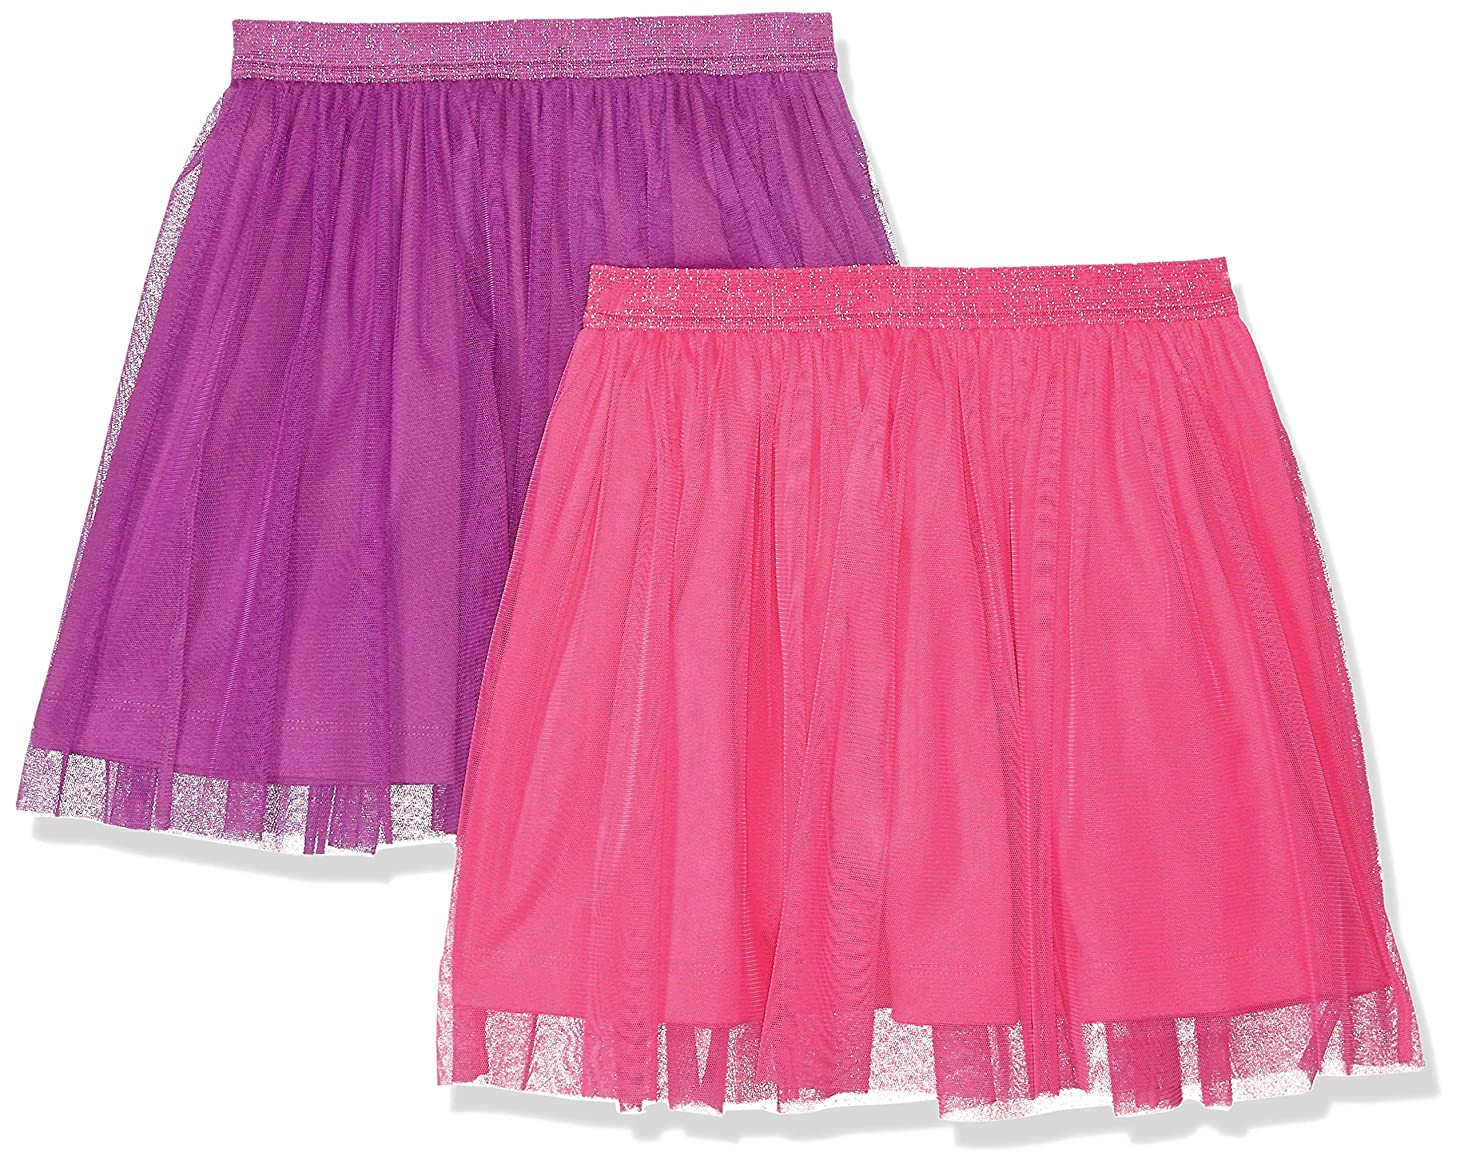 Amazon Brand - Spotted Zebra Girls' Toddler & Kid 2-Pack Tutu Skirts